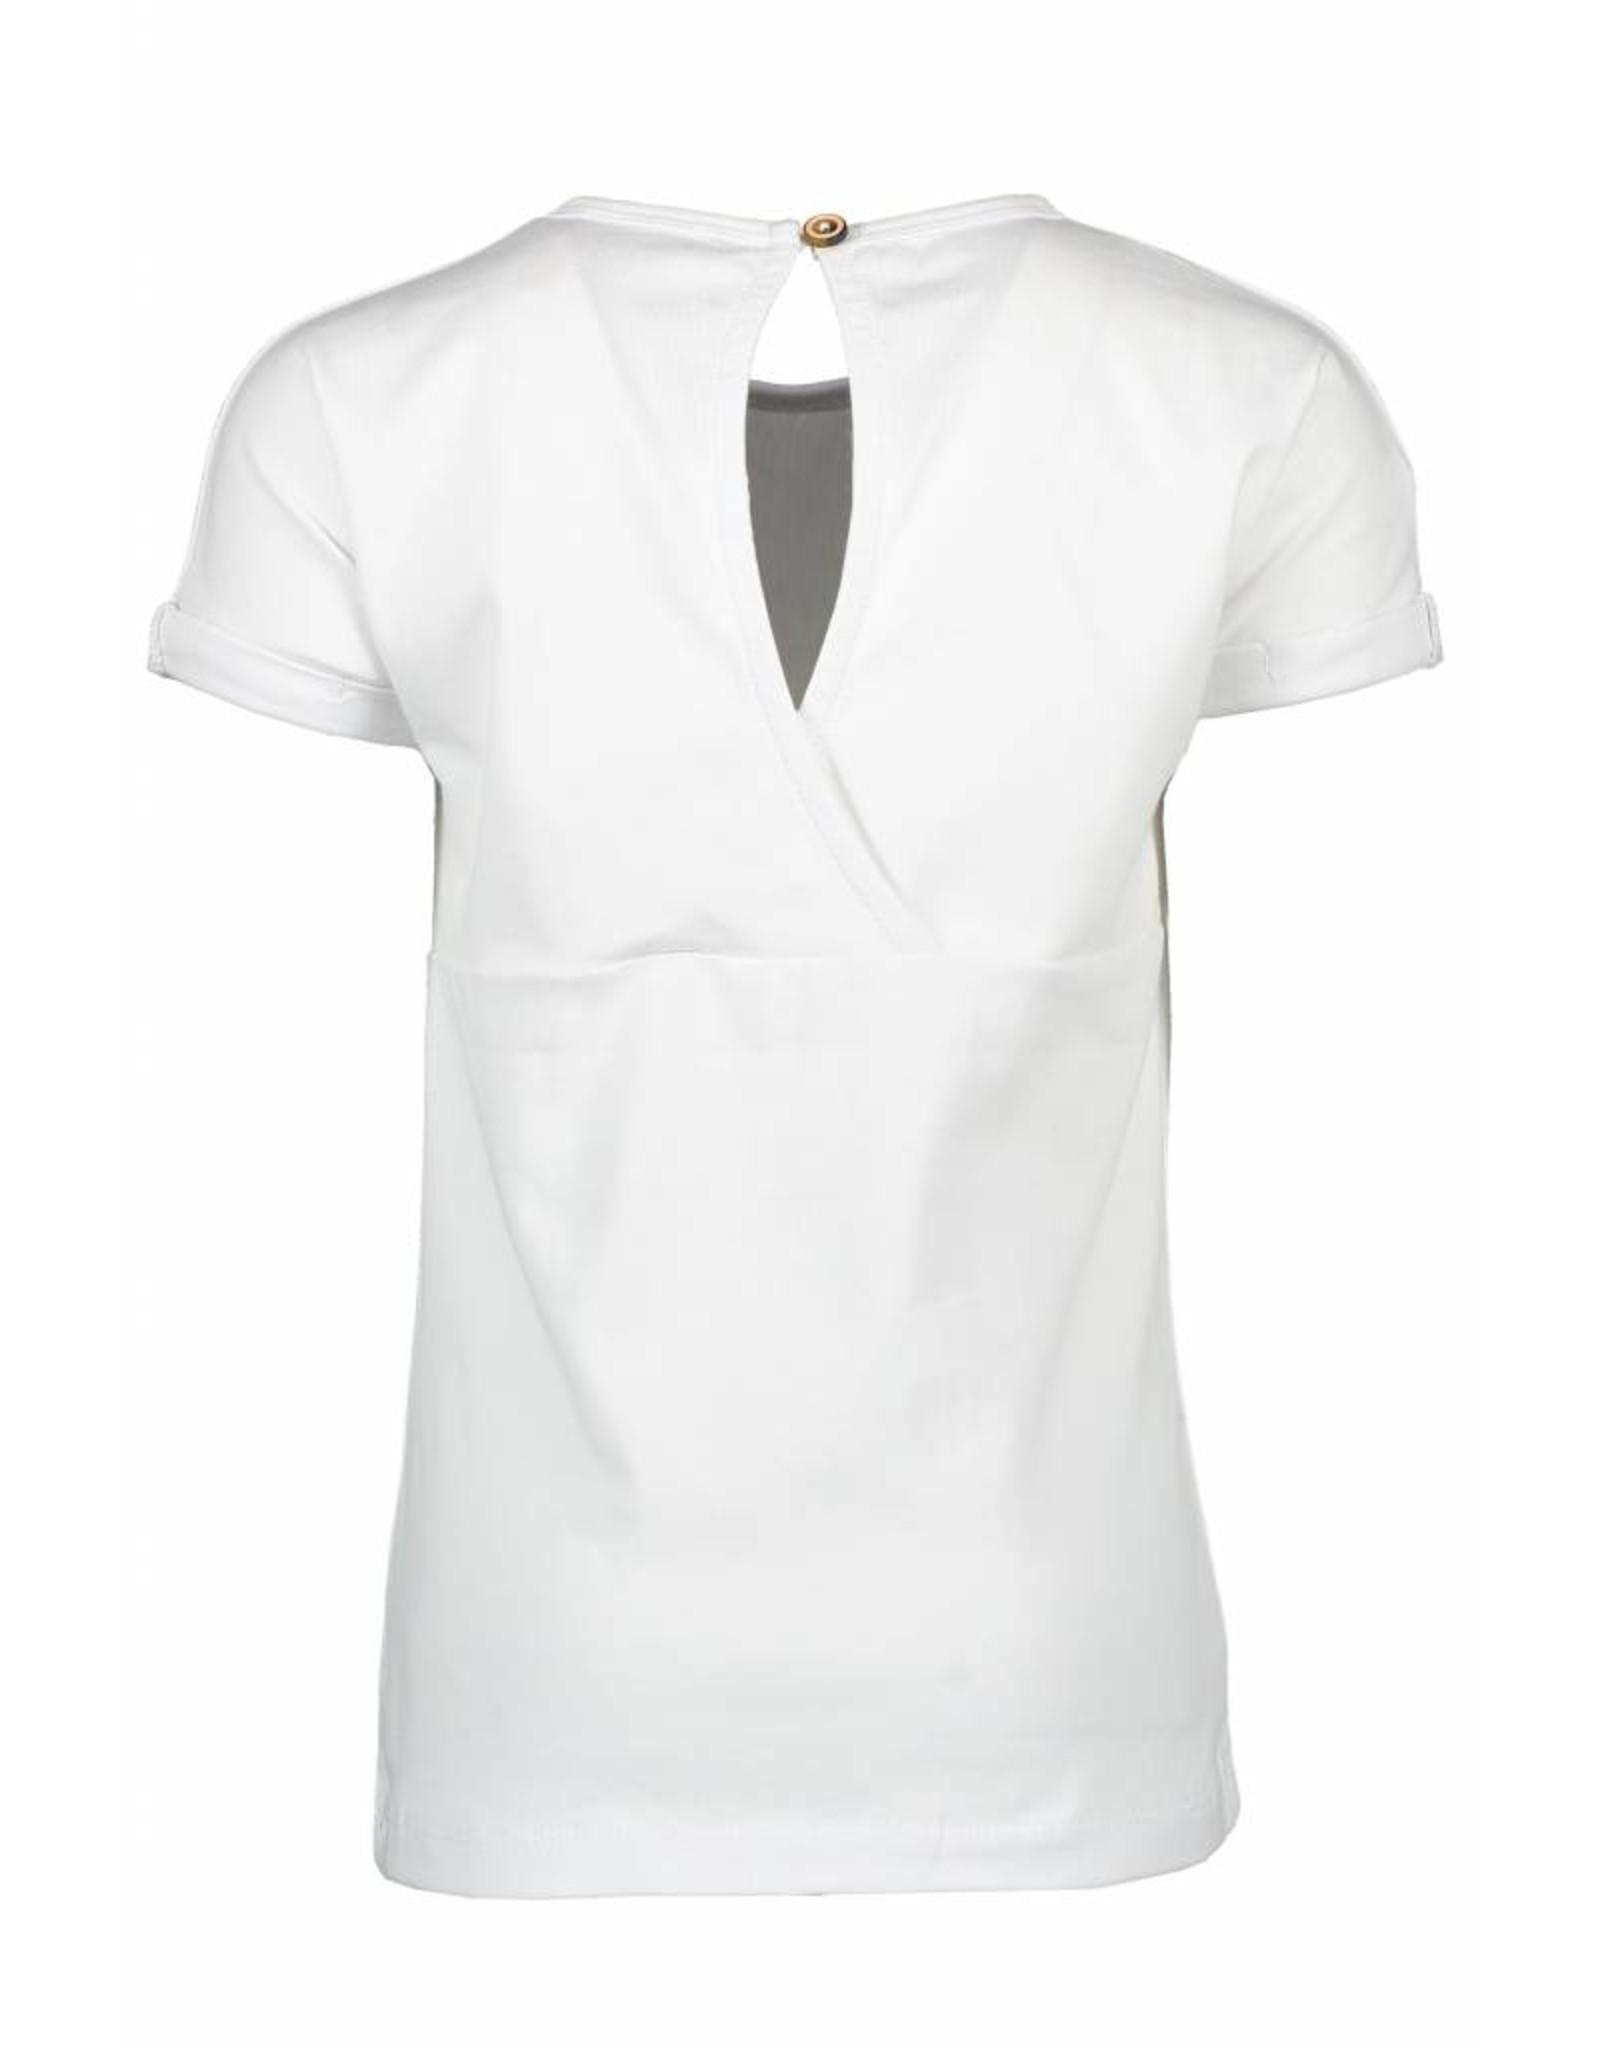 NONO NONO Kasa T-Shirt opening back